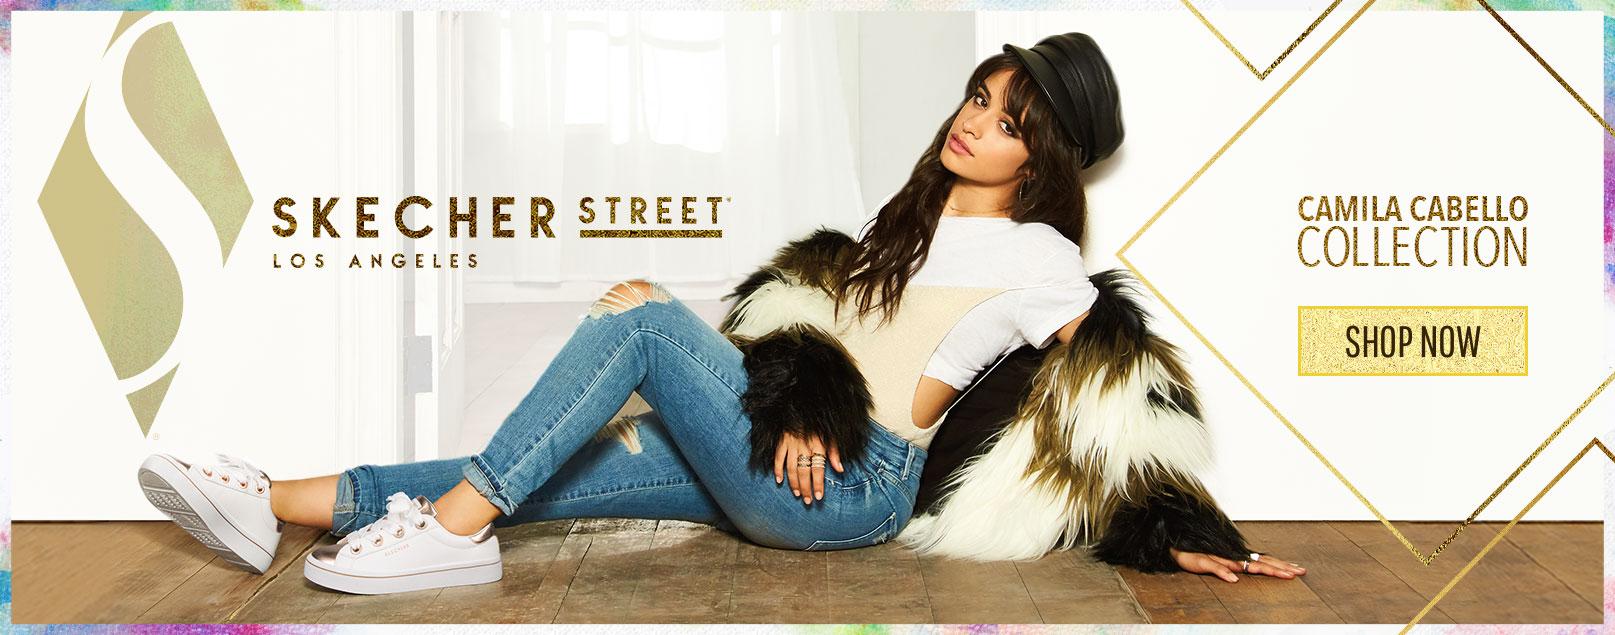 eml28972_skechers_street_camila_cabello_banner_jan18_v1_46b0f57a04f6.jpg